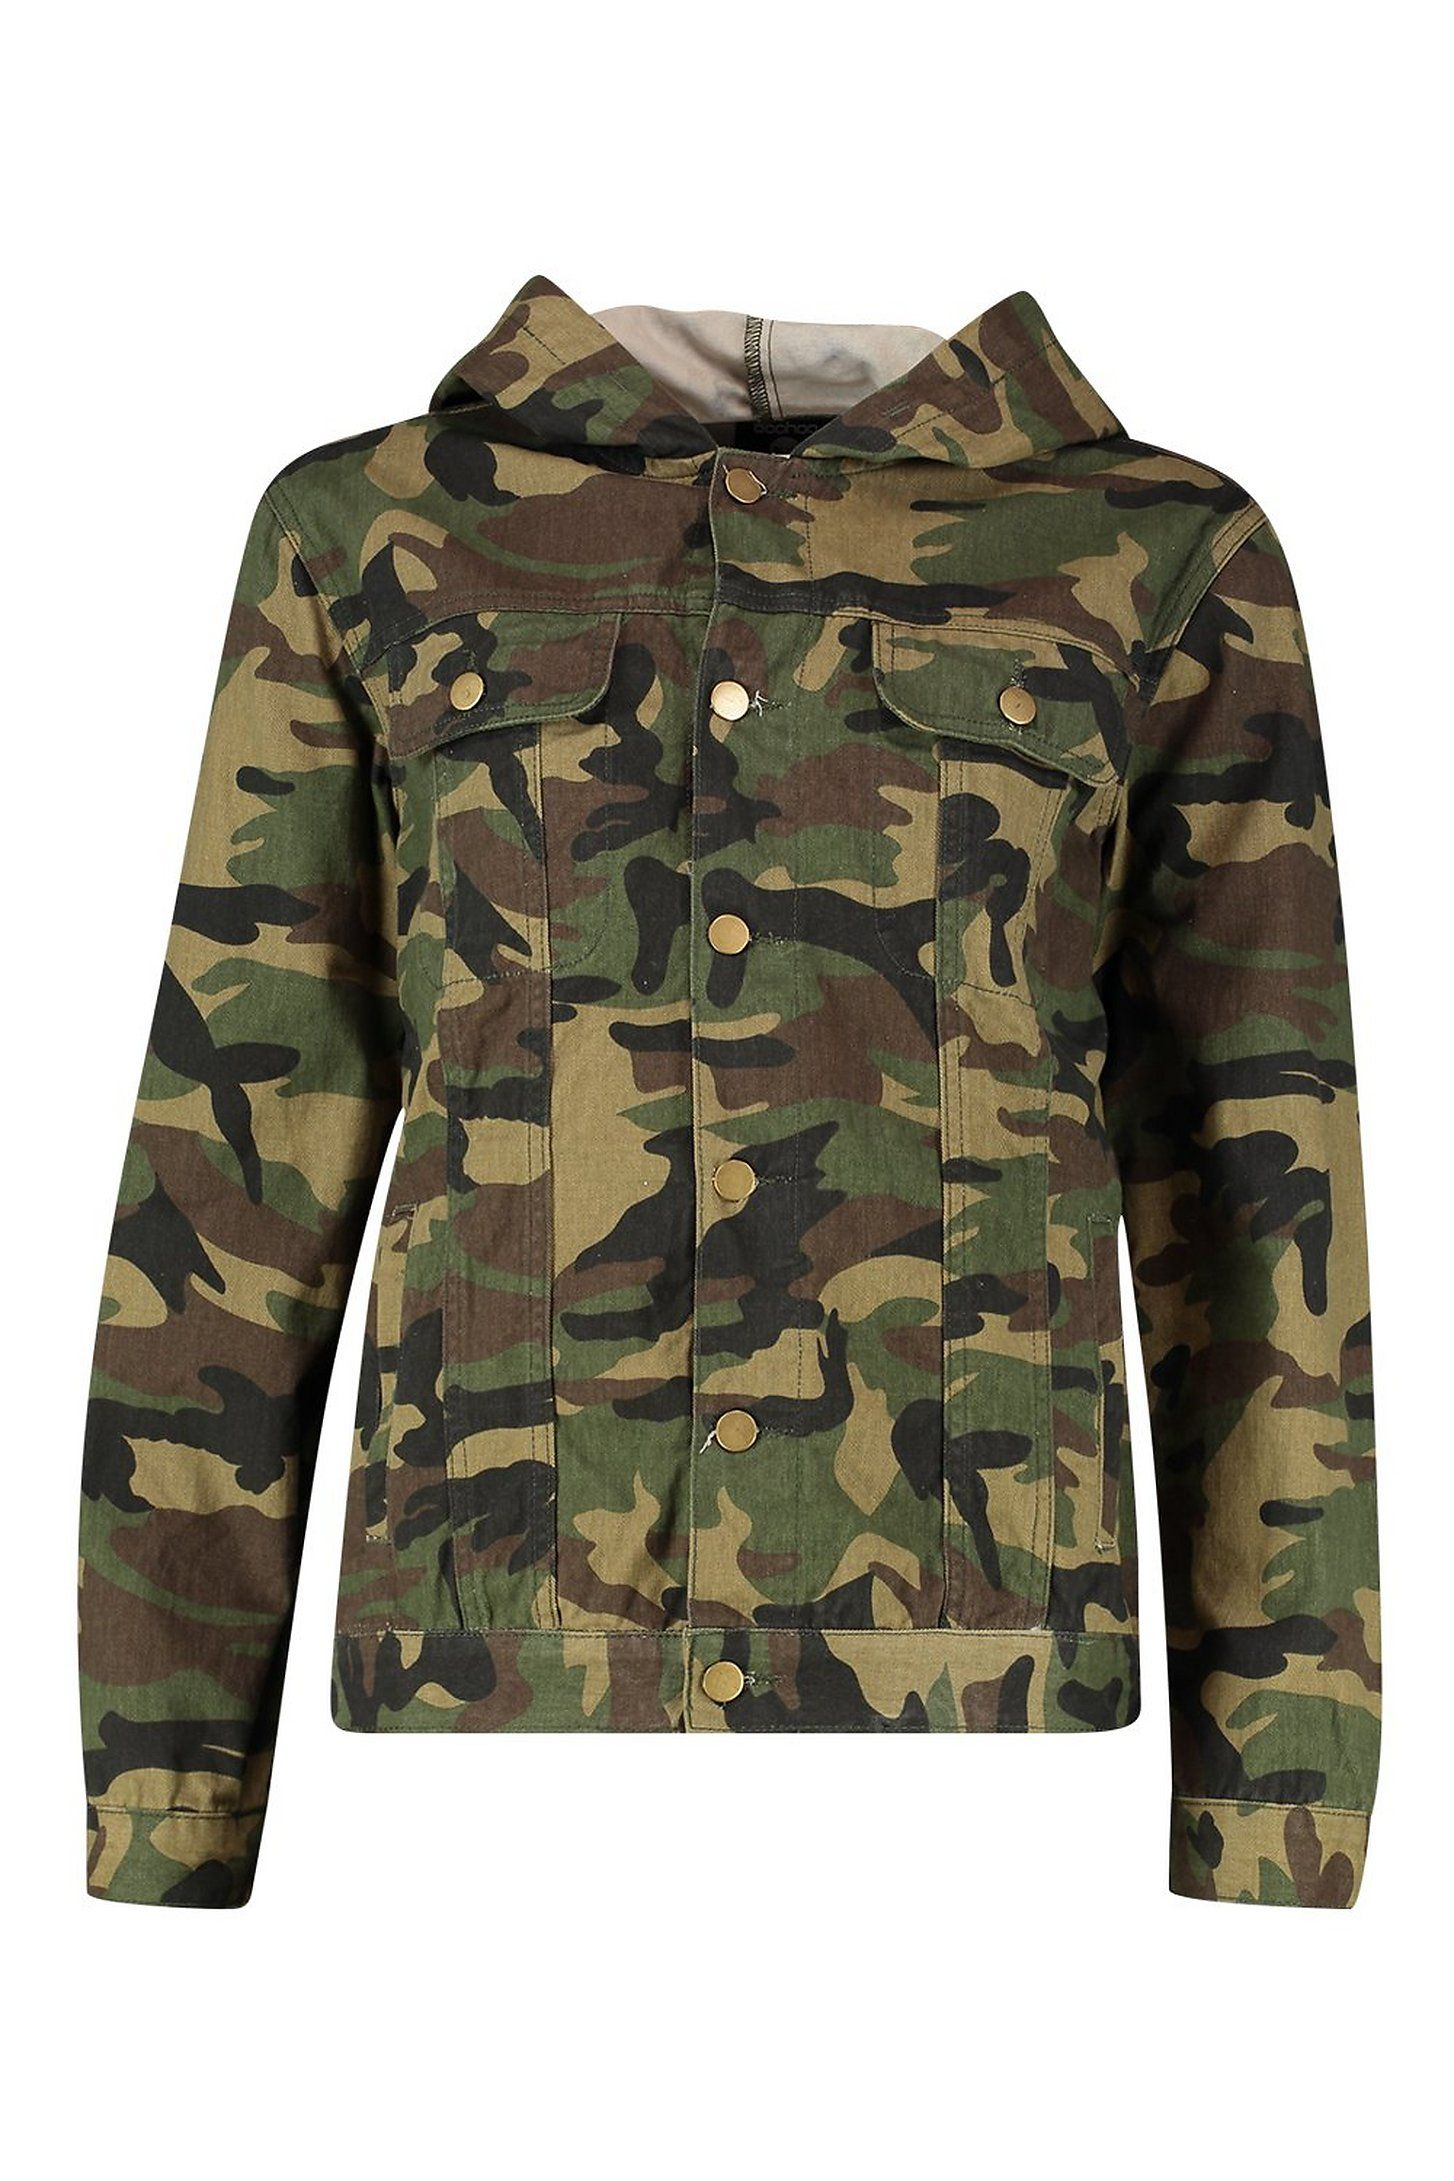 Hooded Oversized Camo Denim Jacket Boohoo Jean Jacket Outfits Camo Denim Jacket Jackets [ 2181 x 1454 Pixel ]